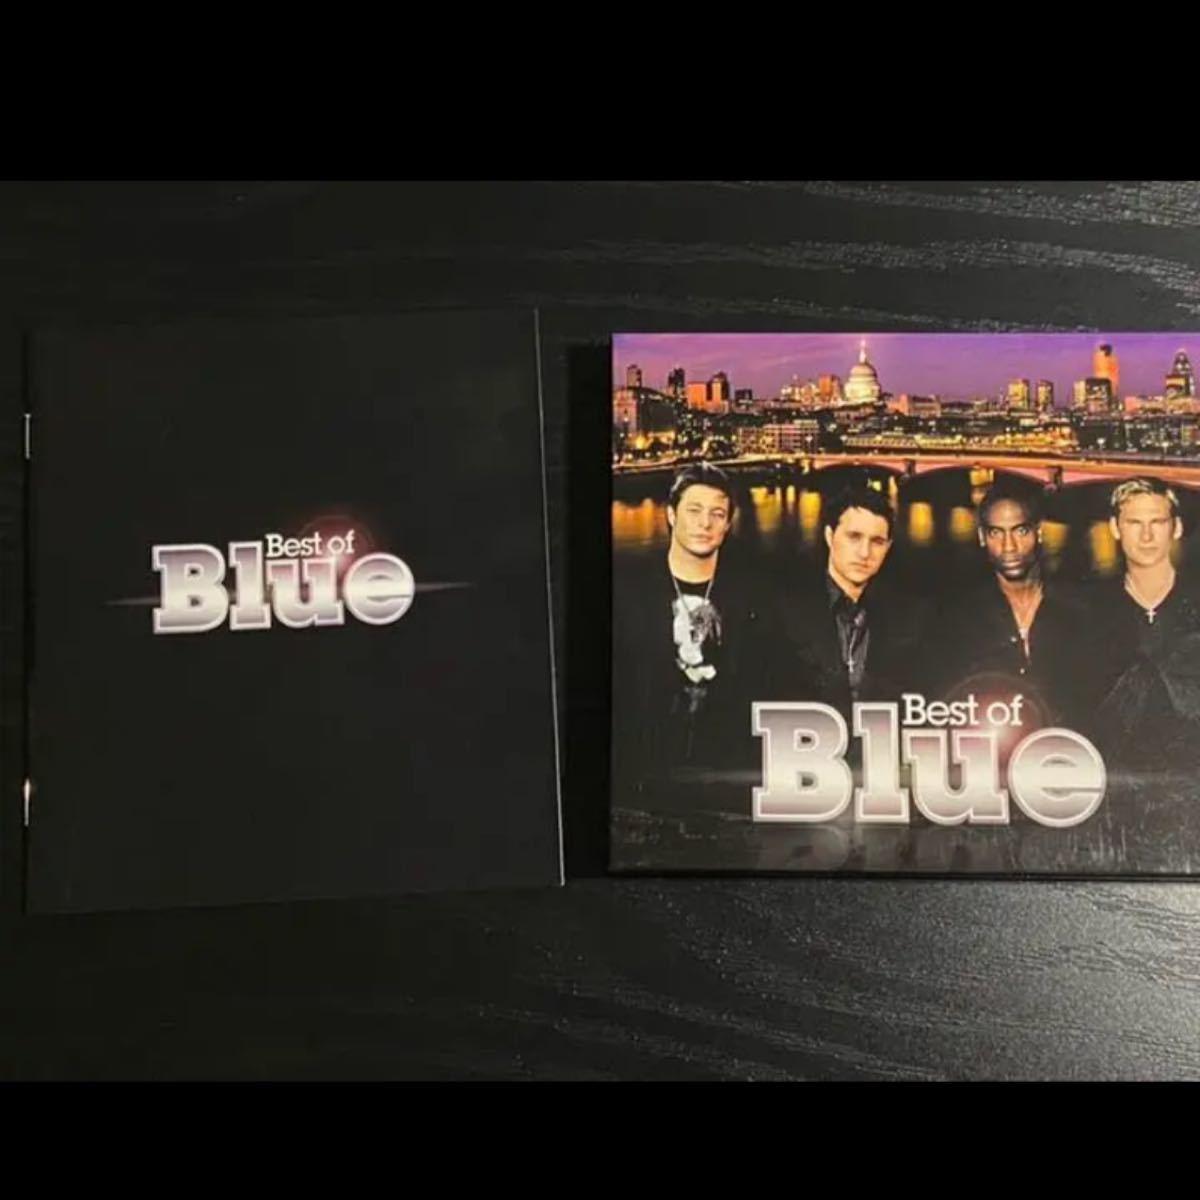 BEST OF BLUE ベスト オブ ブルー THE GIFT 結婚式 CD